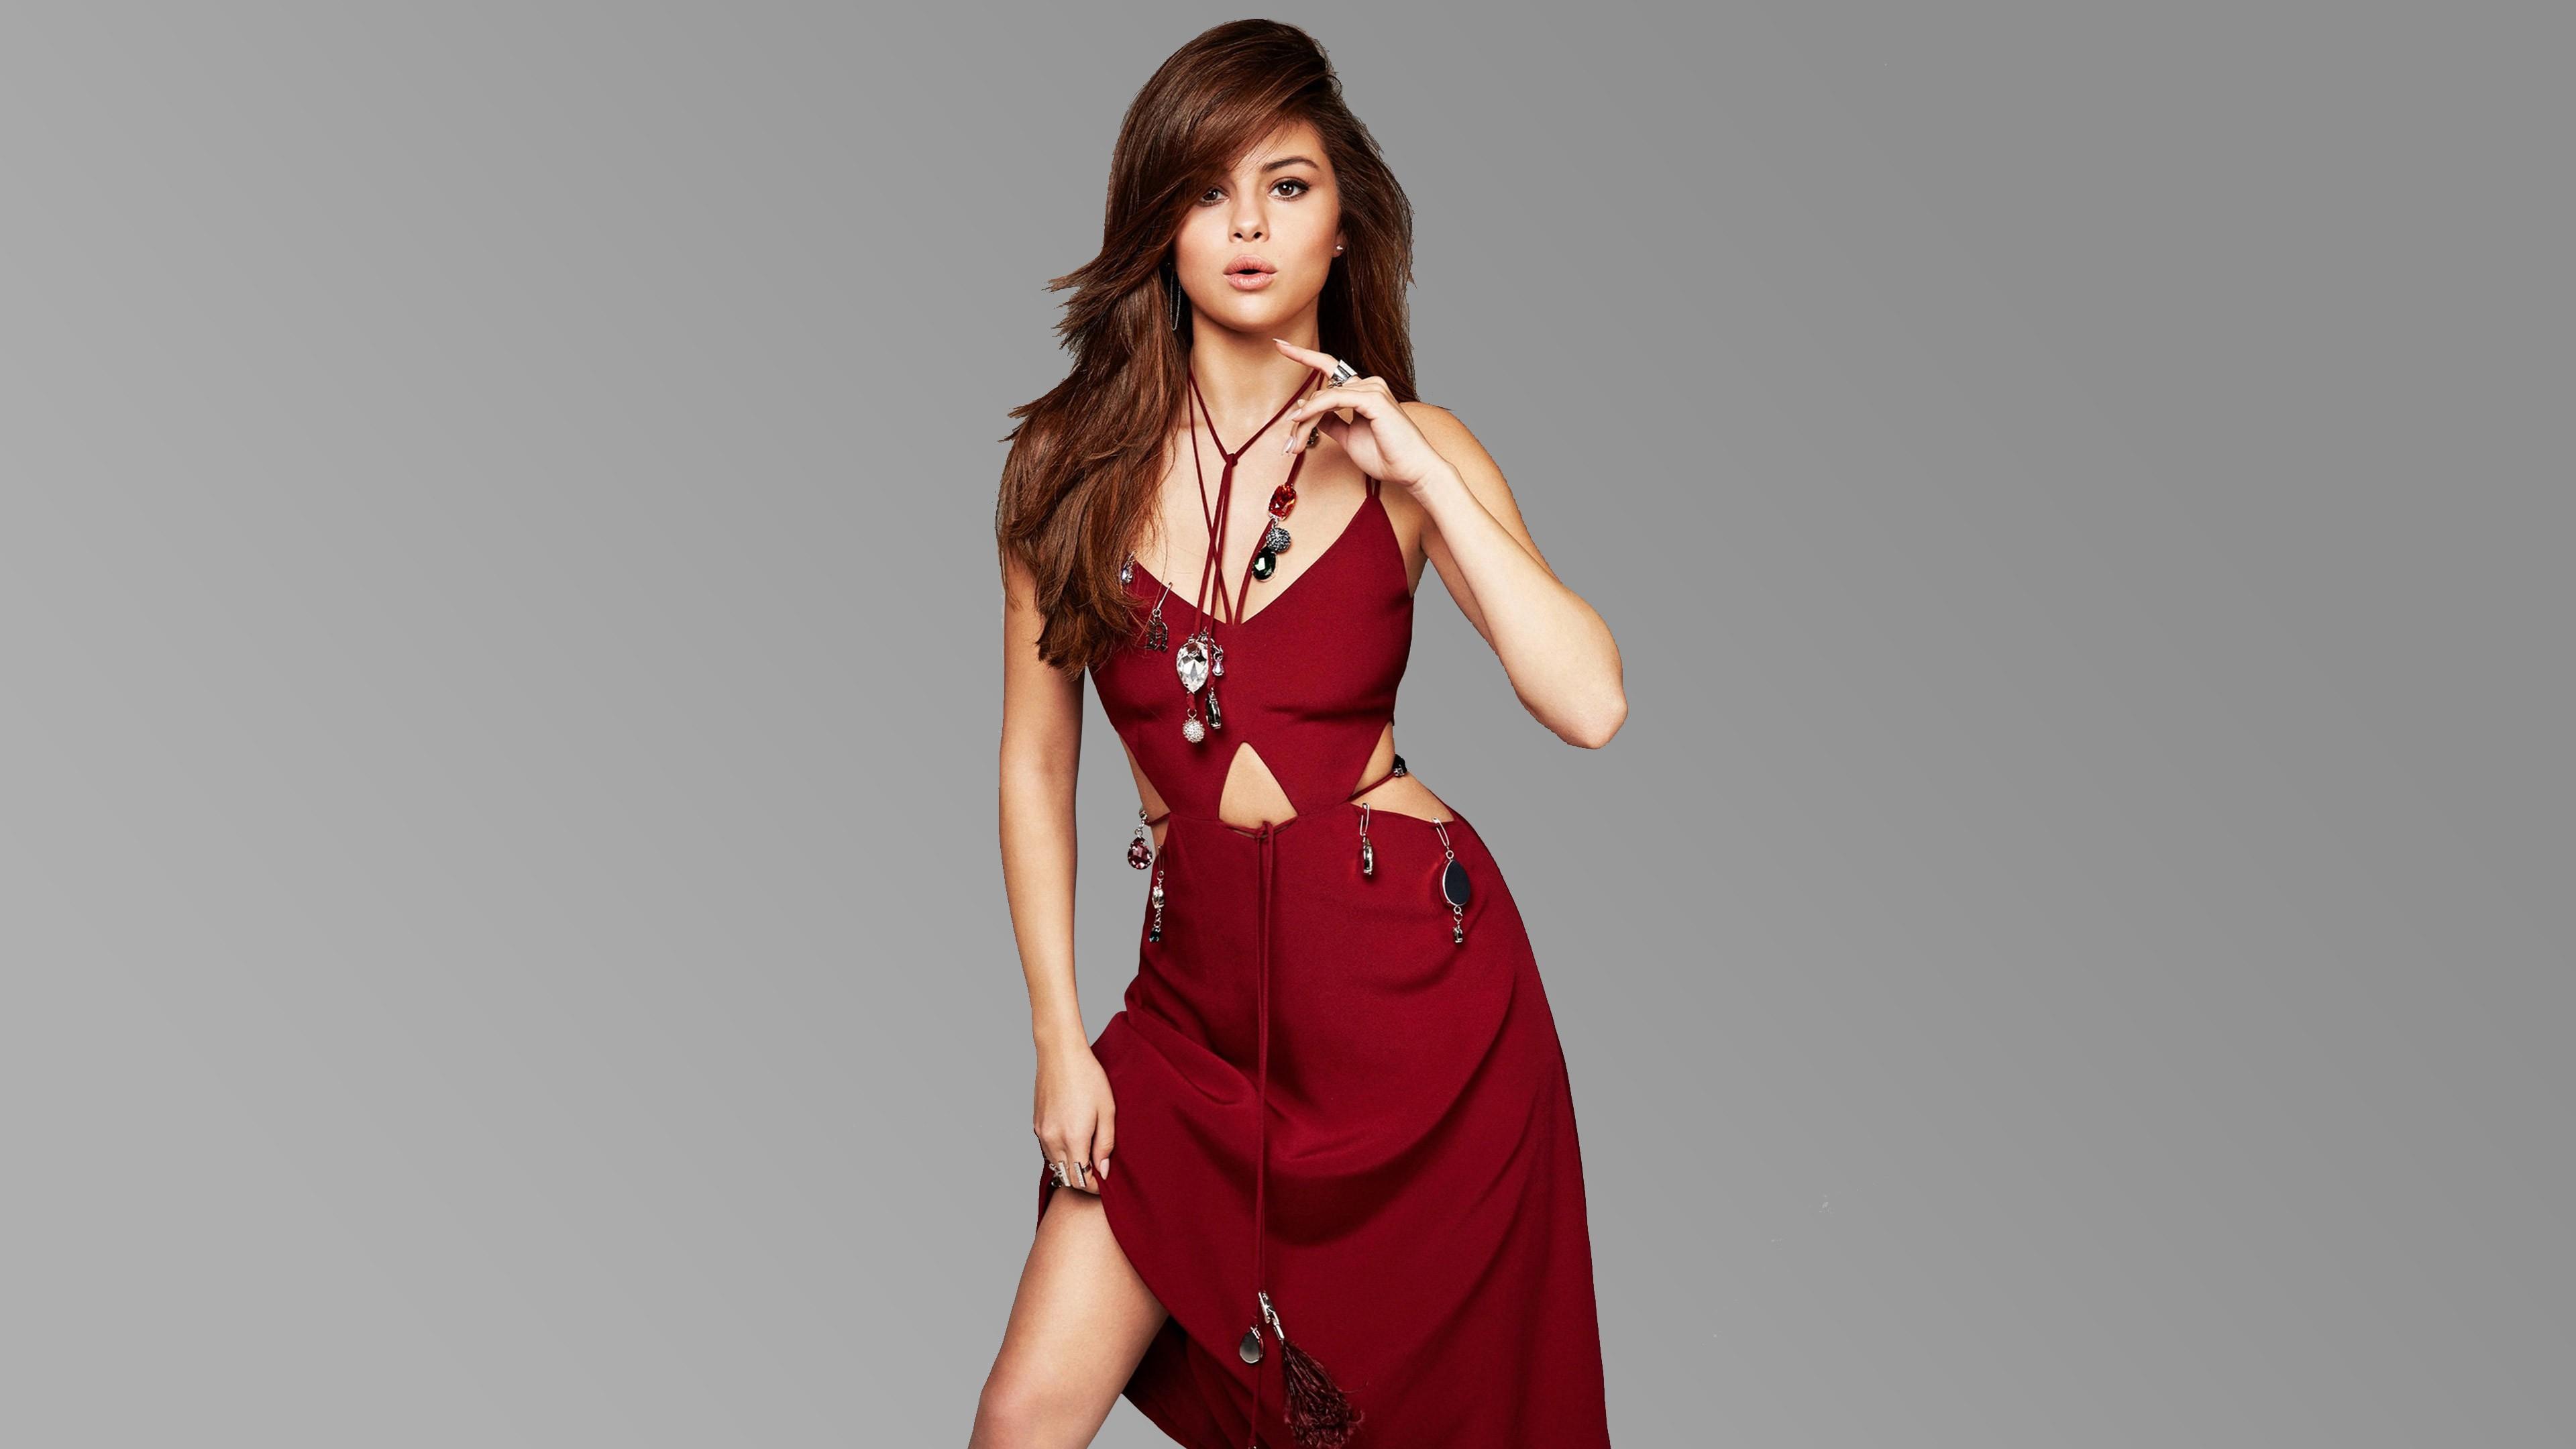 Wallpaper Selena Gomez, red dress, look, Most popular ... Rosie Huntington Whiteley Lips